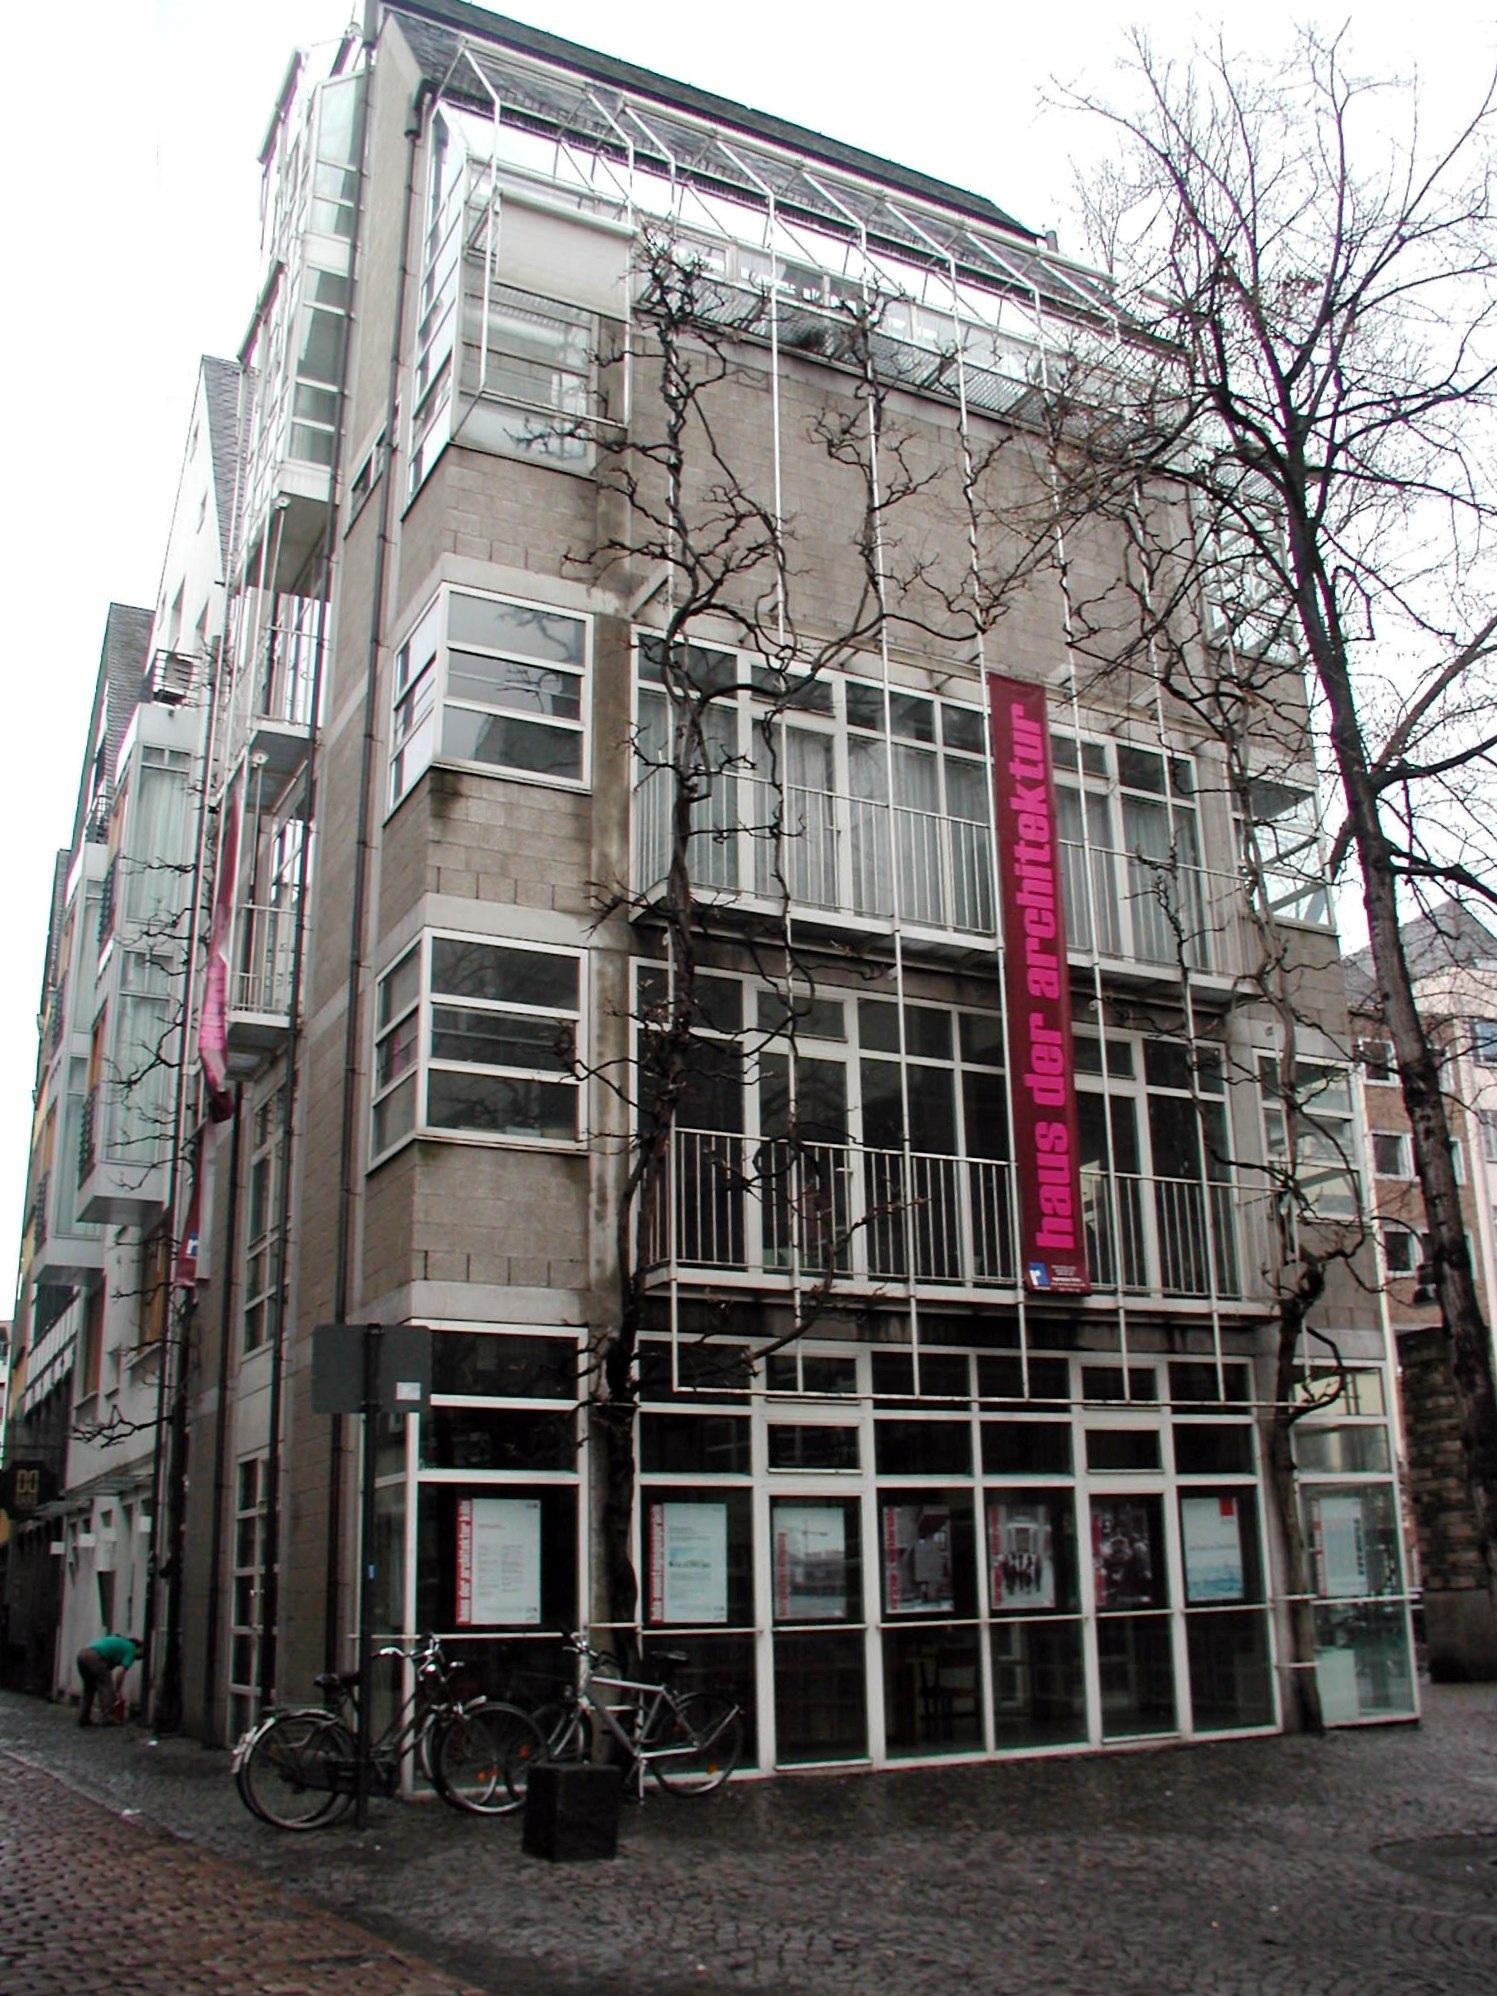 Architektur Köln file lintgasse 9 köln haus der architektur 050 jpg wikimedia commons